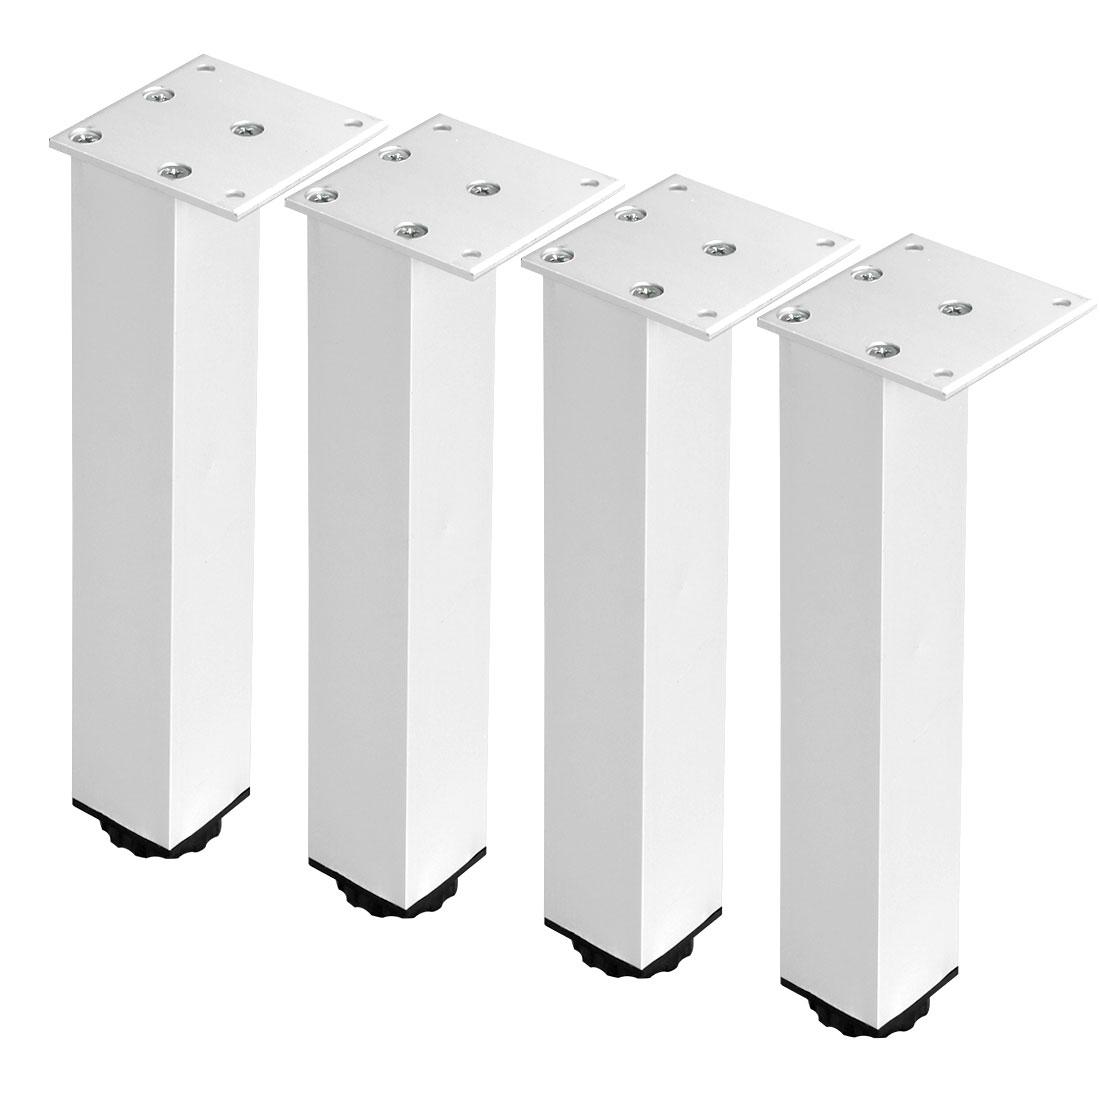 "10"" Furniture Leg Aluminium Alloy Sofa Feet Replacement Height Adjuster 4pcs"